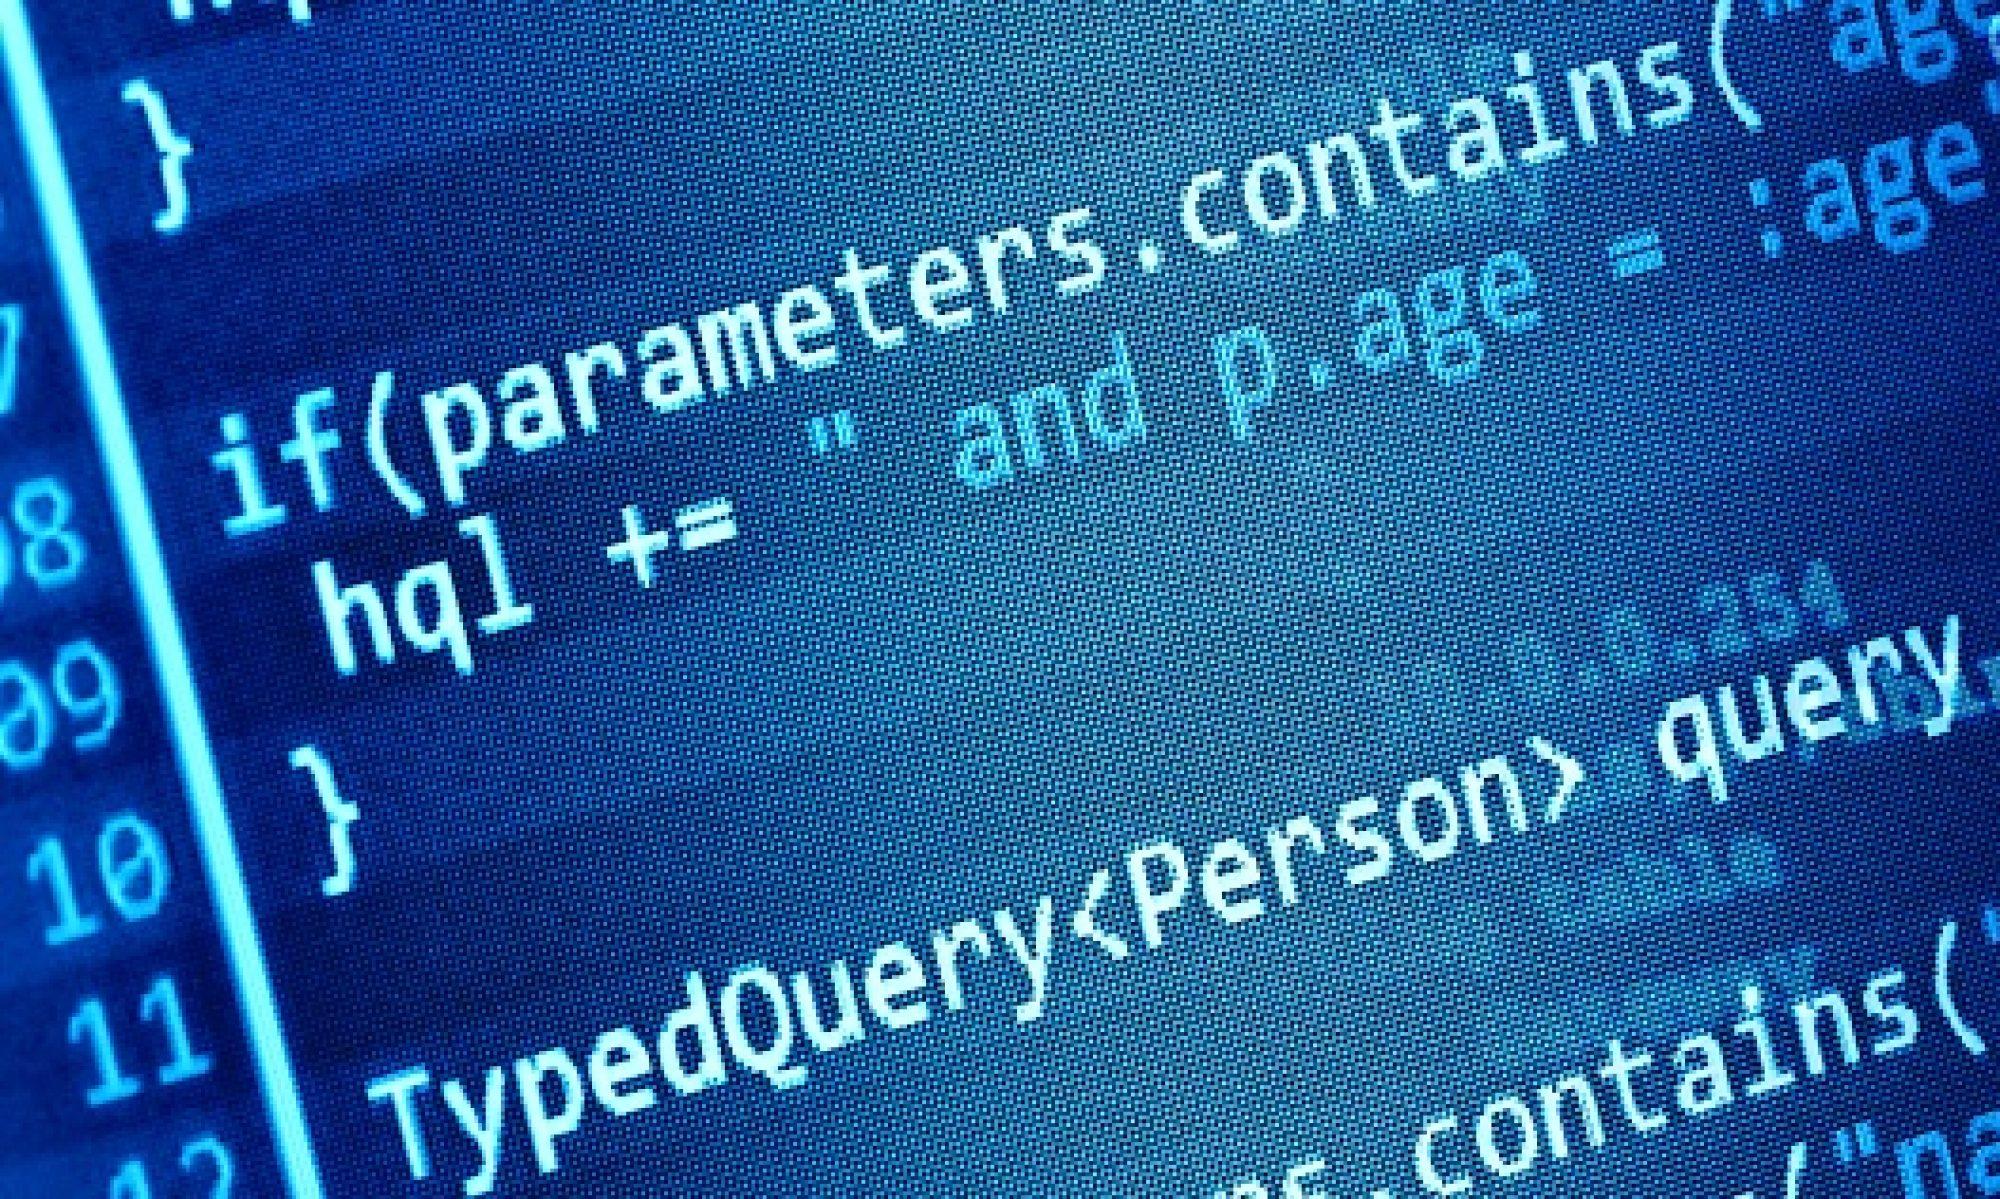 We do code